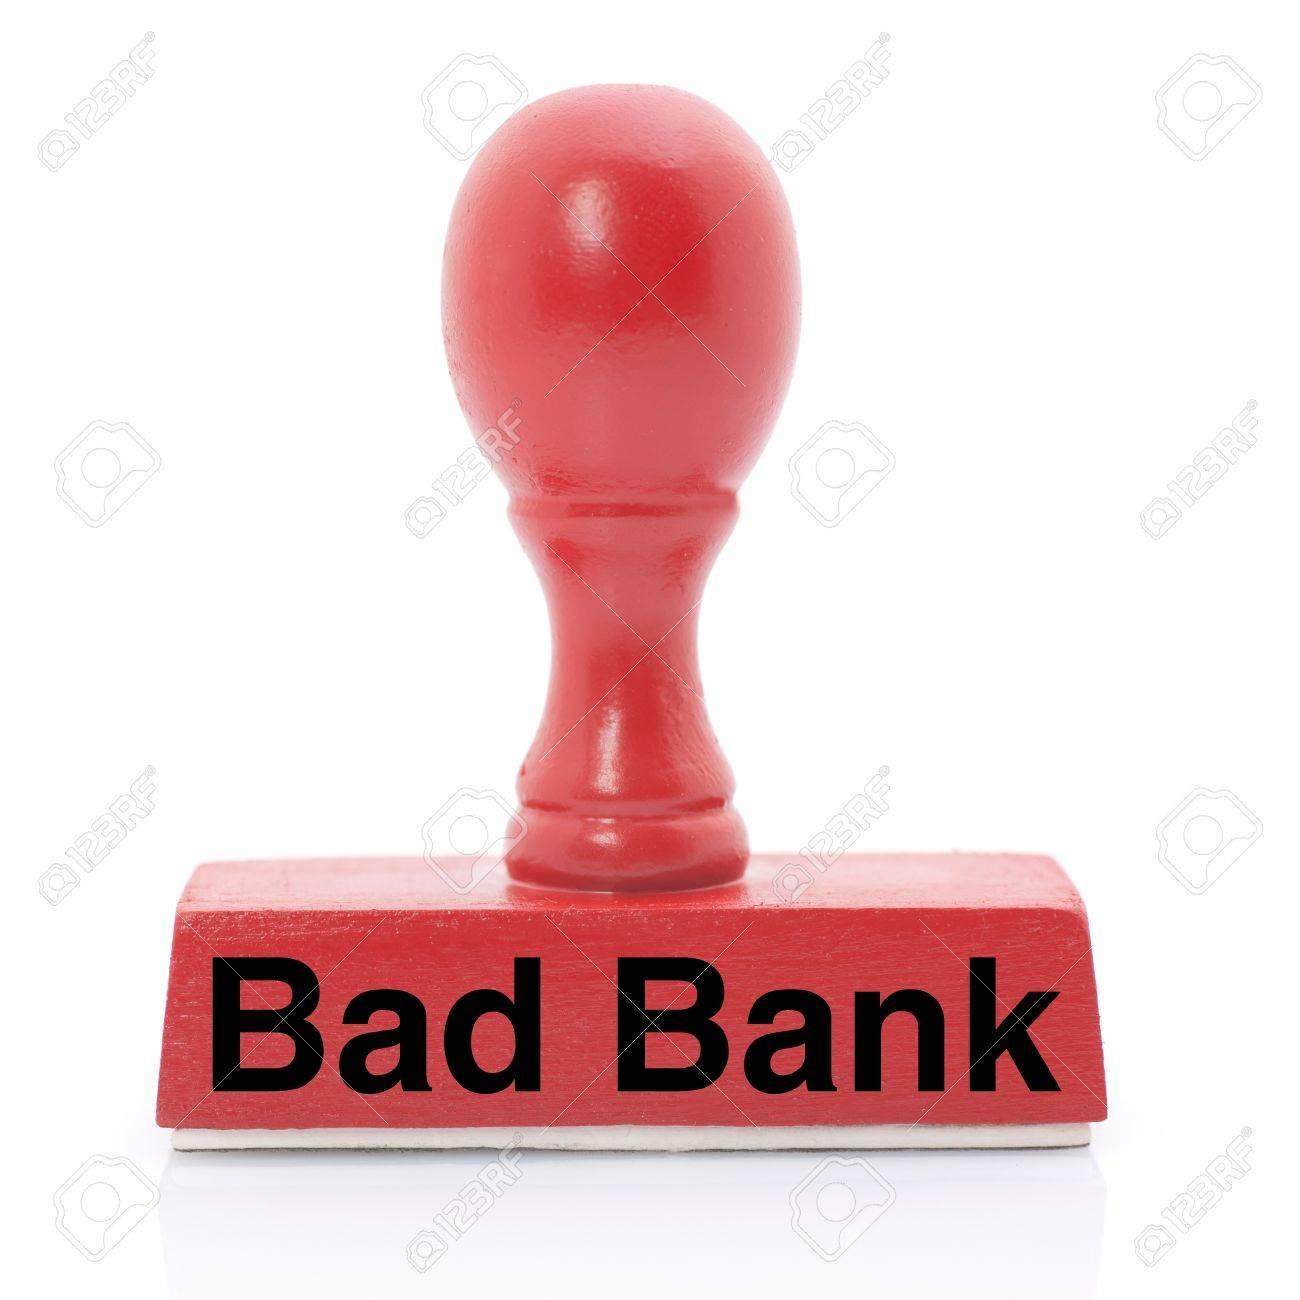 Nearer a bad bank